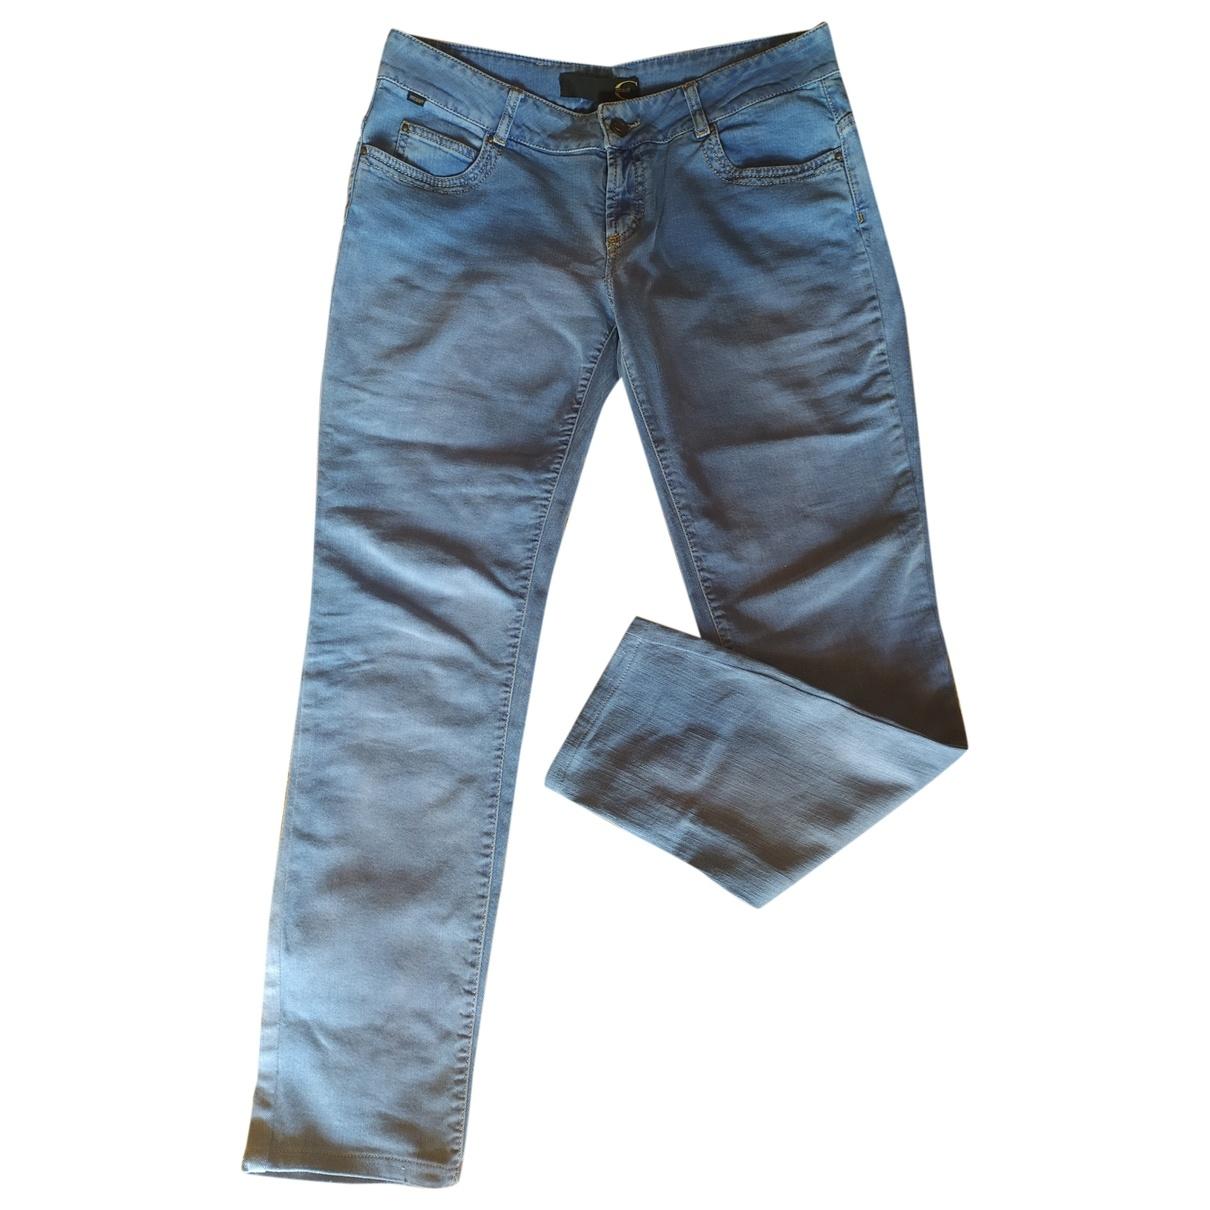 Just Cavalli \N Blue Denim - Jeans Jeans for Women 31 US